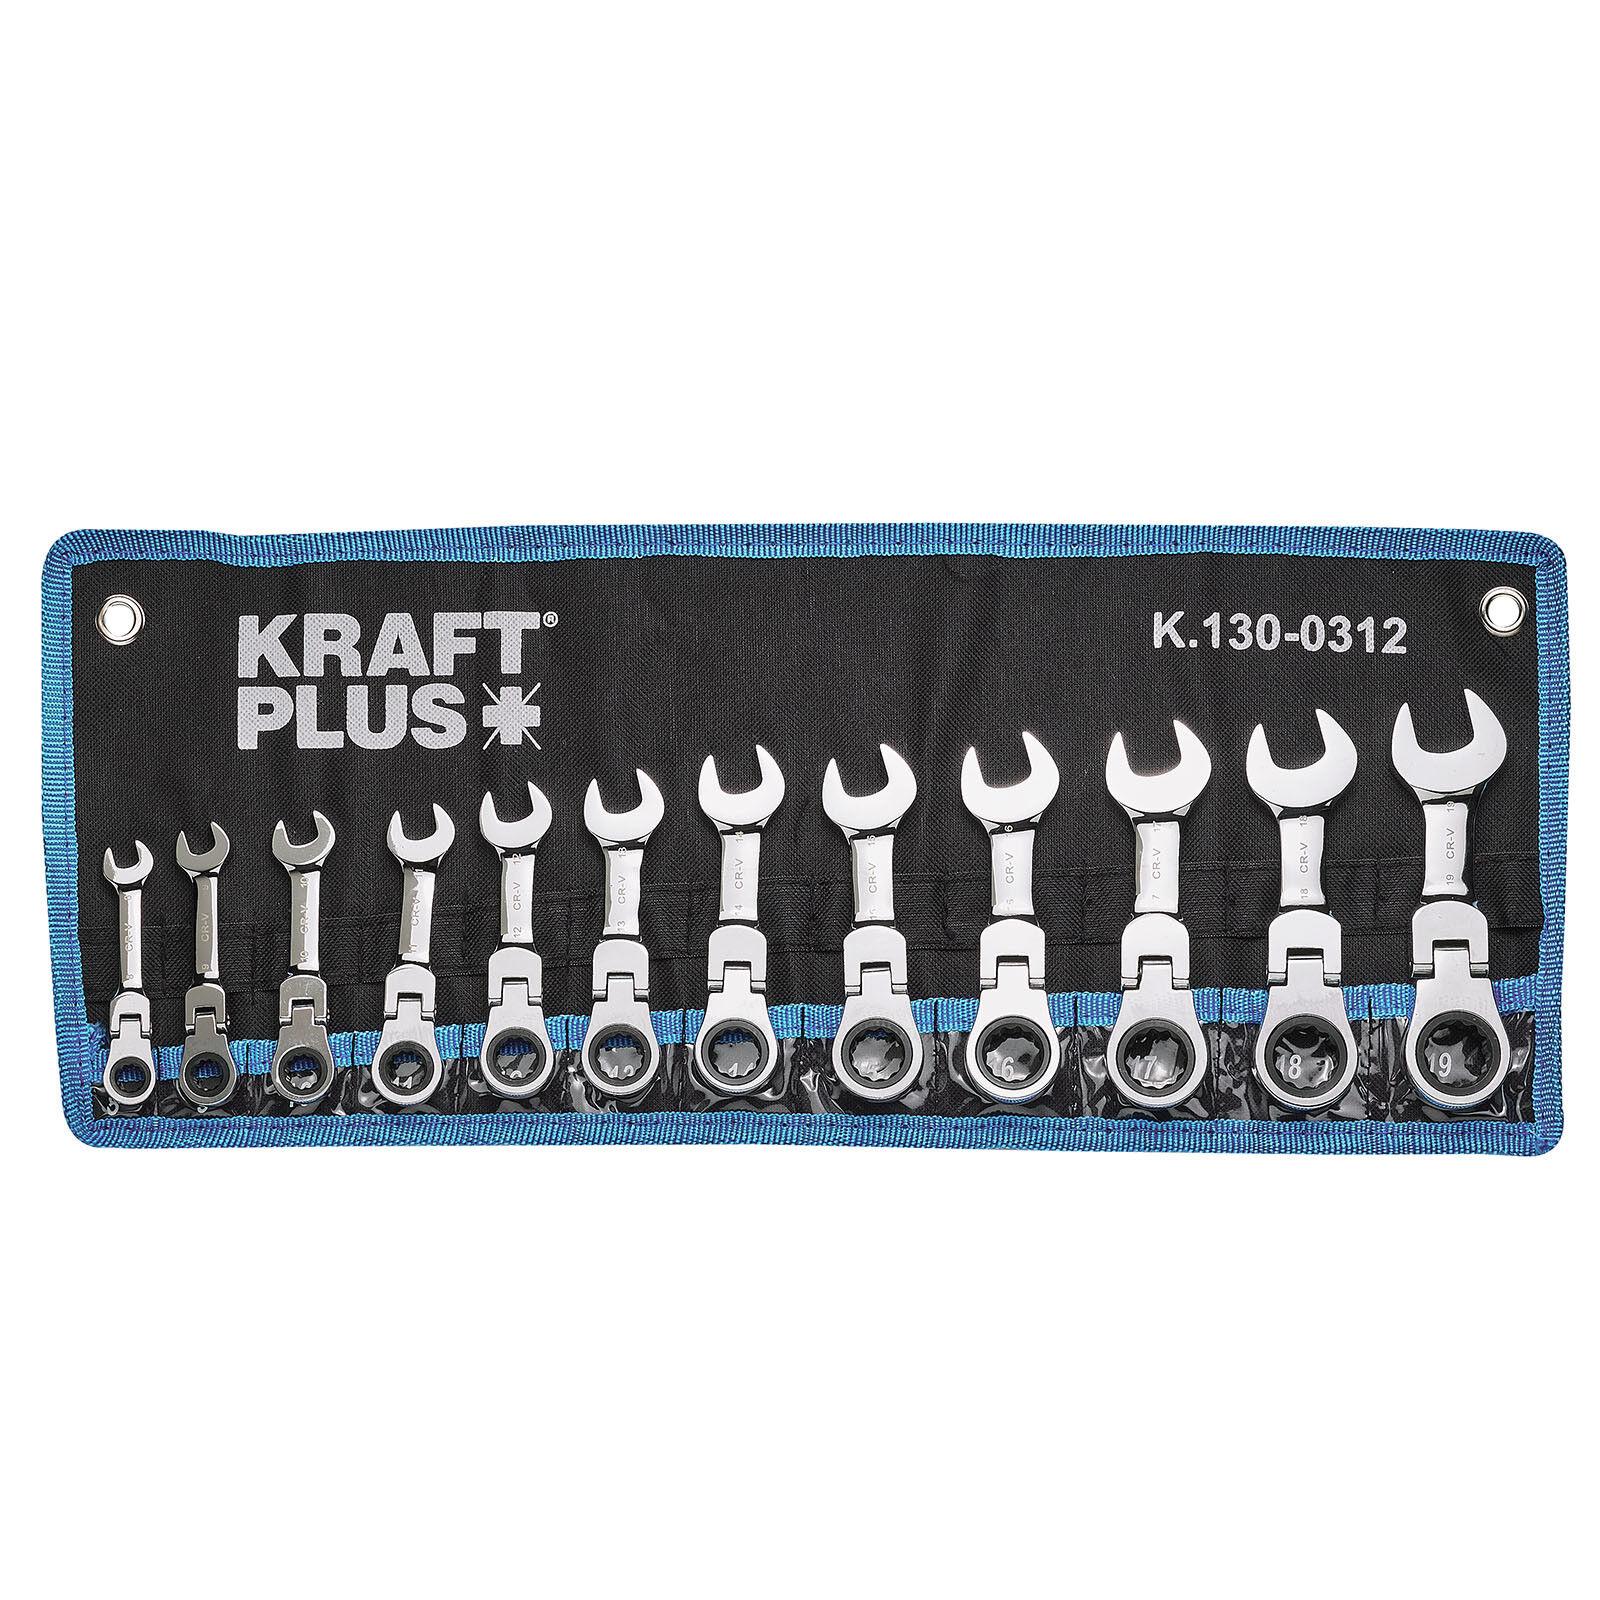 KRAFTPLUS® K.130-0312 Ringmaul-Ratschenschlüssel-Satz 12-tlg. extra Kurz 8-19 mm